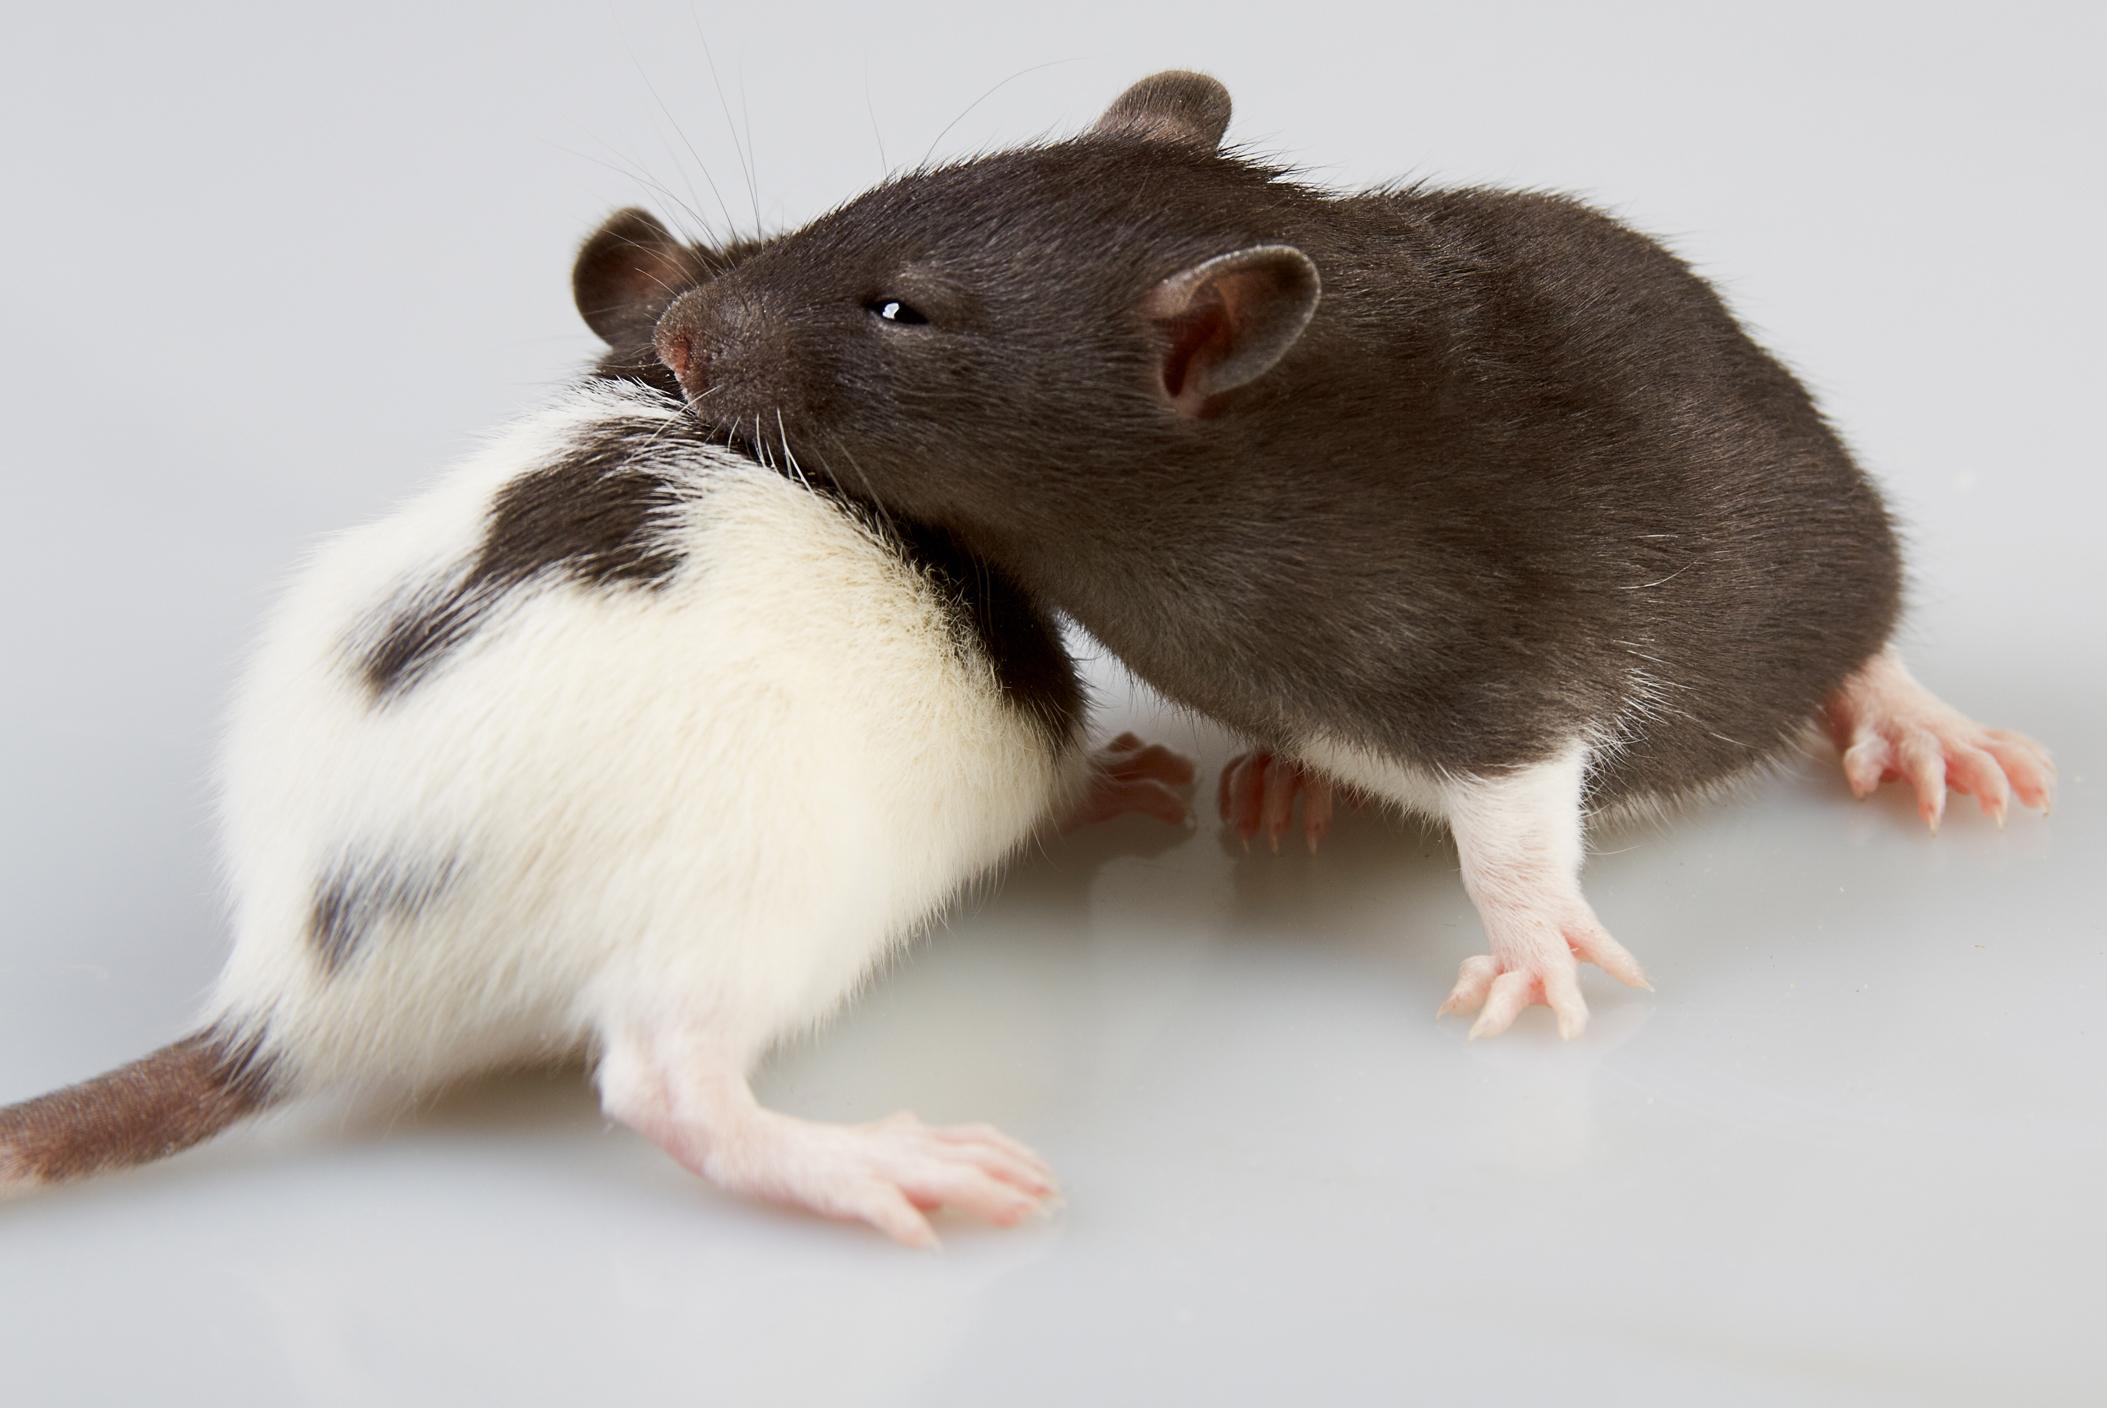 rats_snuggling.jpg